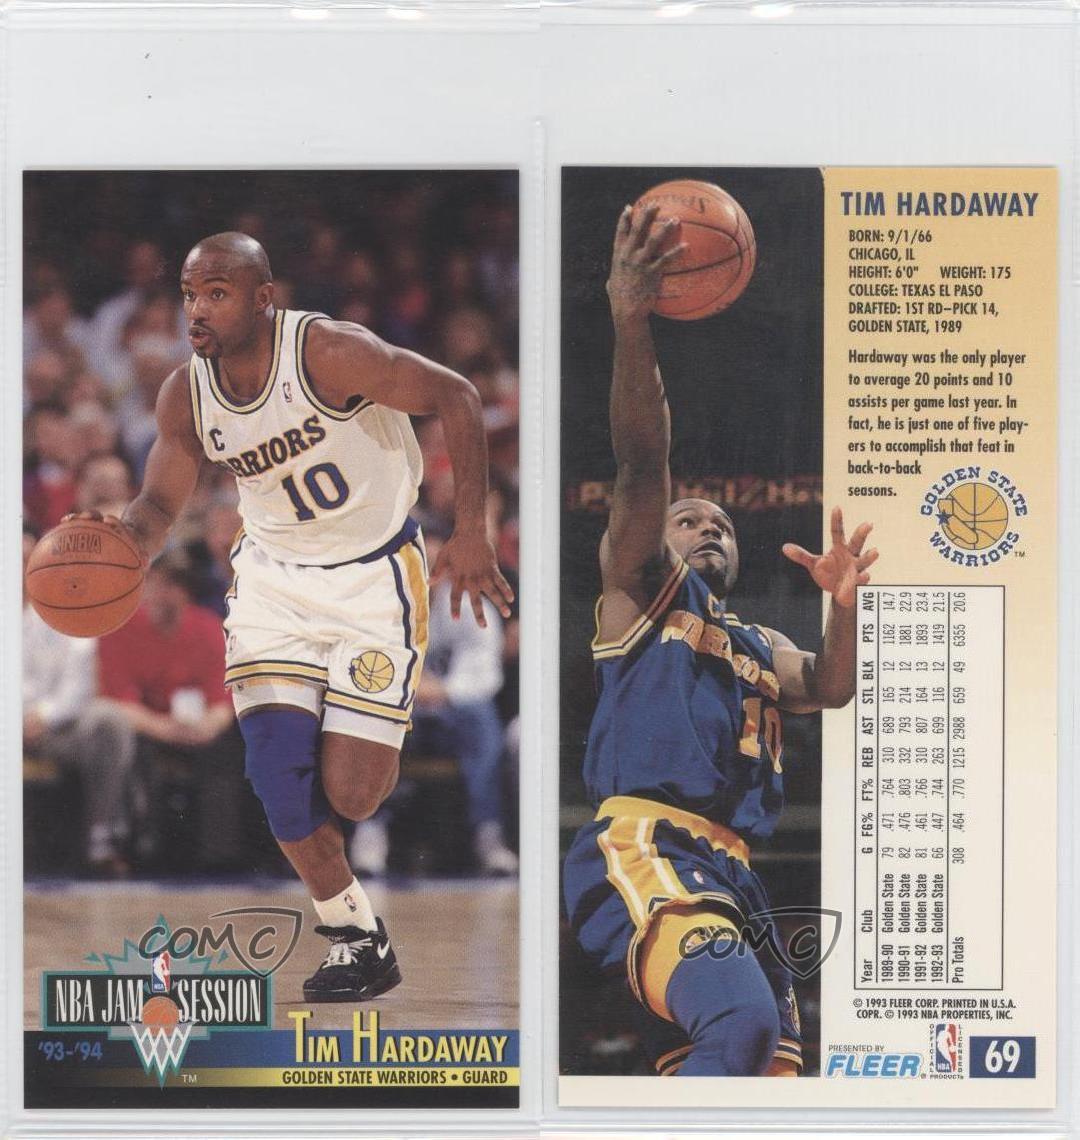 1993-94 NBA Jam Session #69 Tim Hardaway Golden State